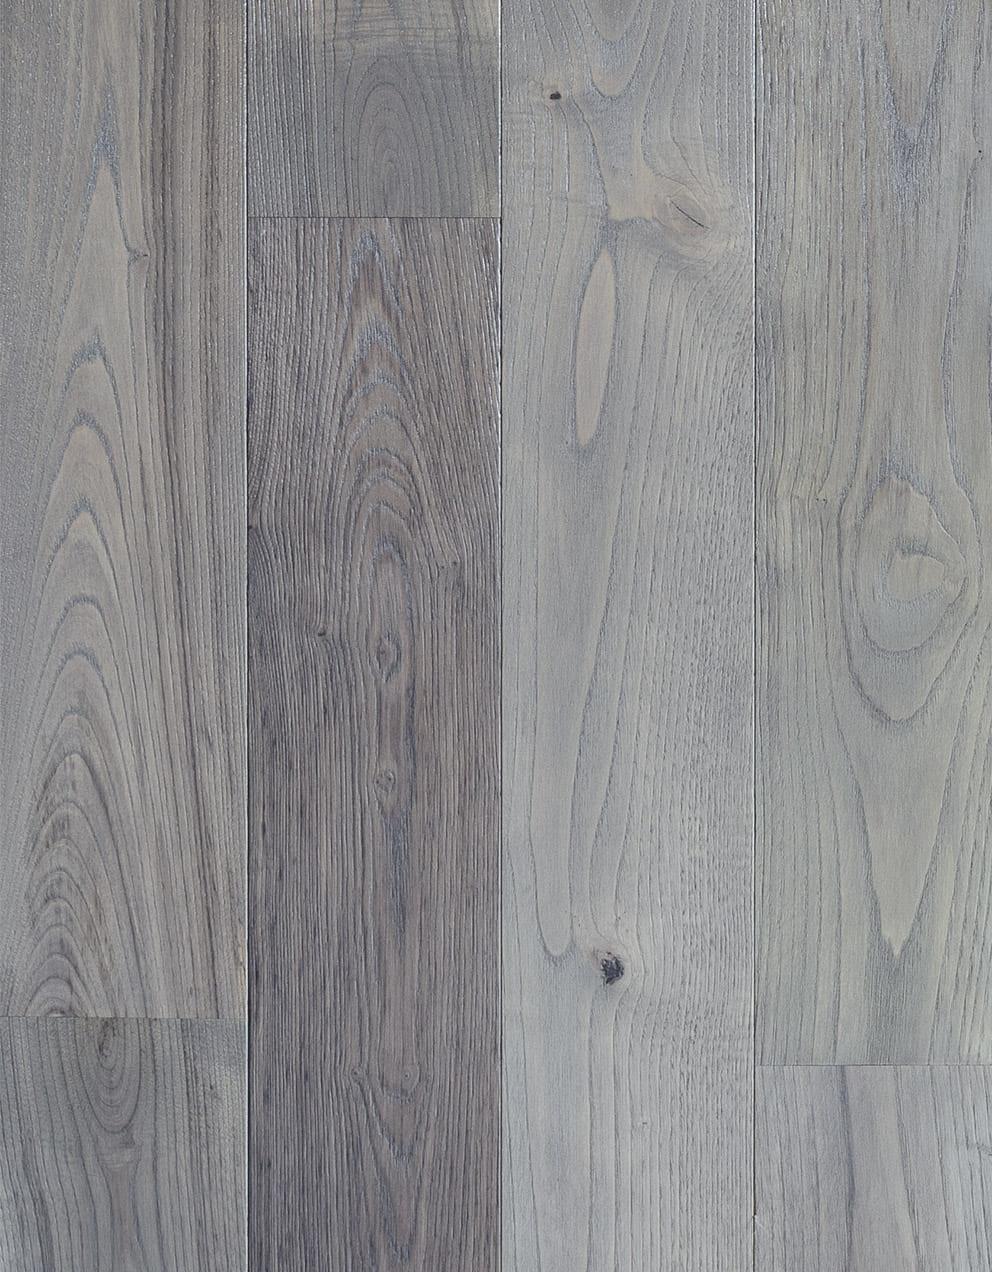 Tarima de madera Castaño gris. Detarima